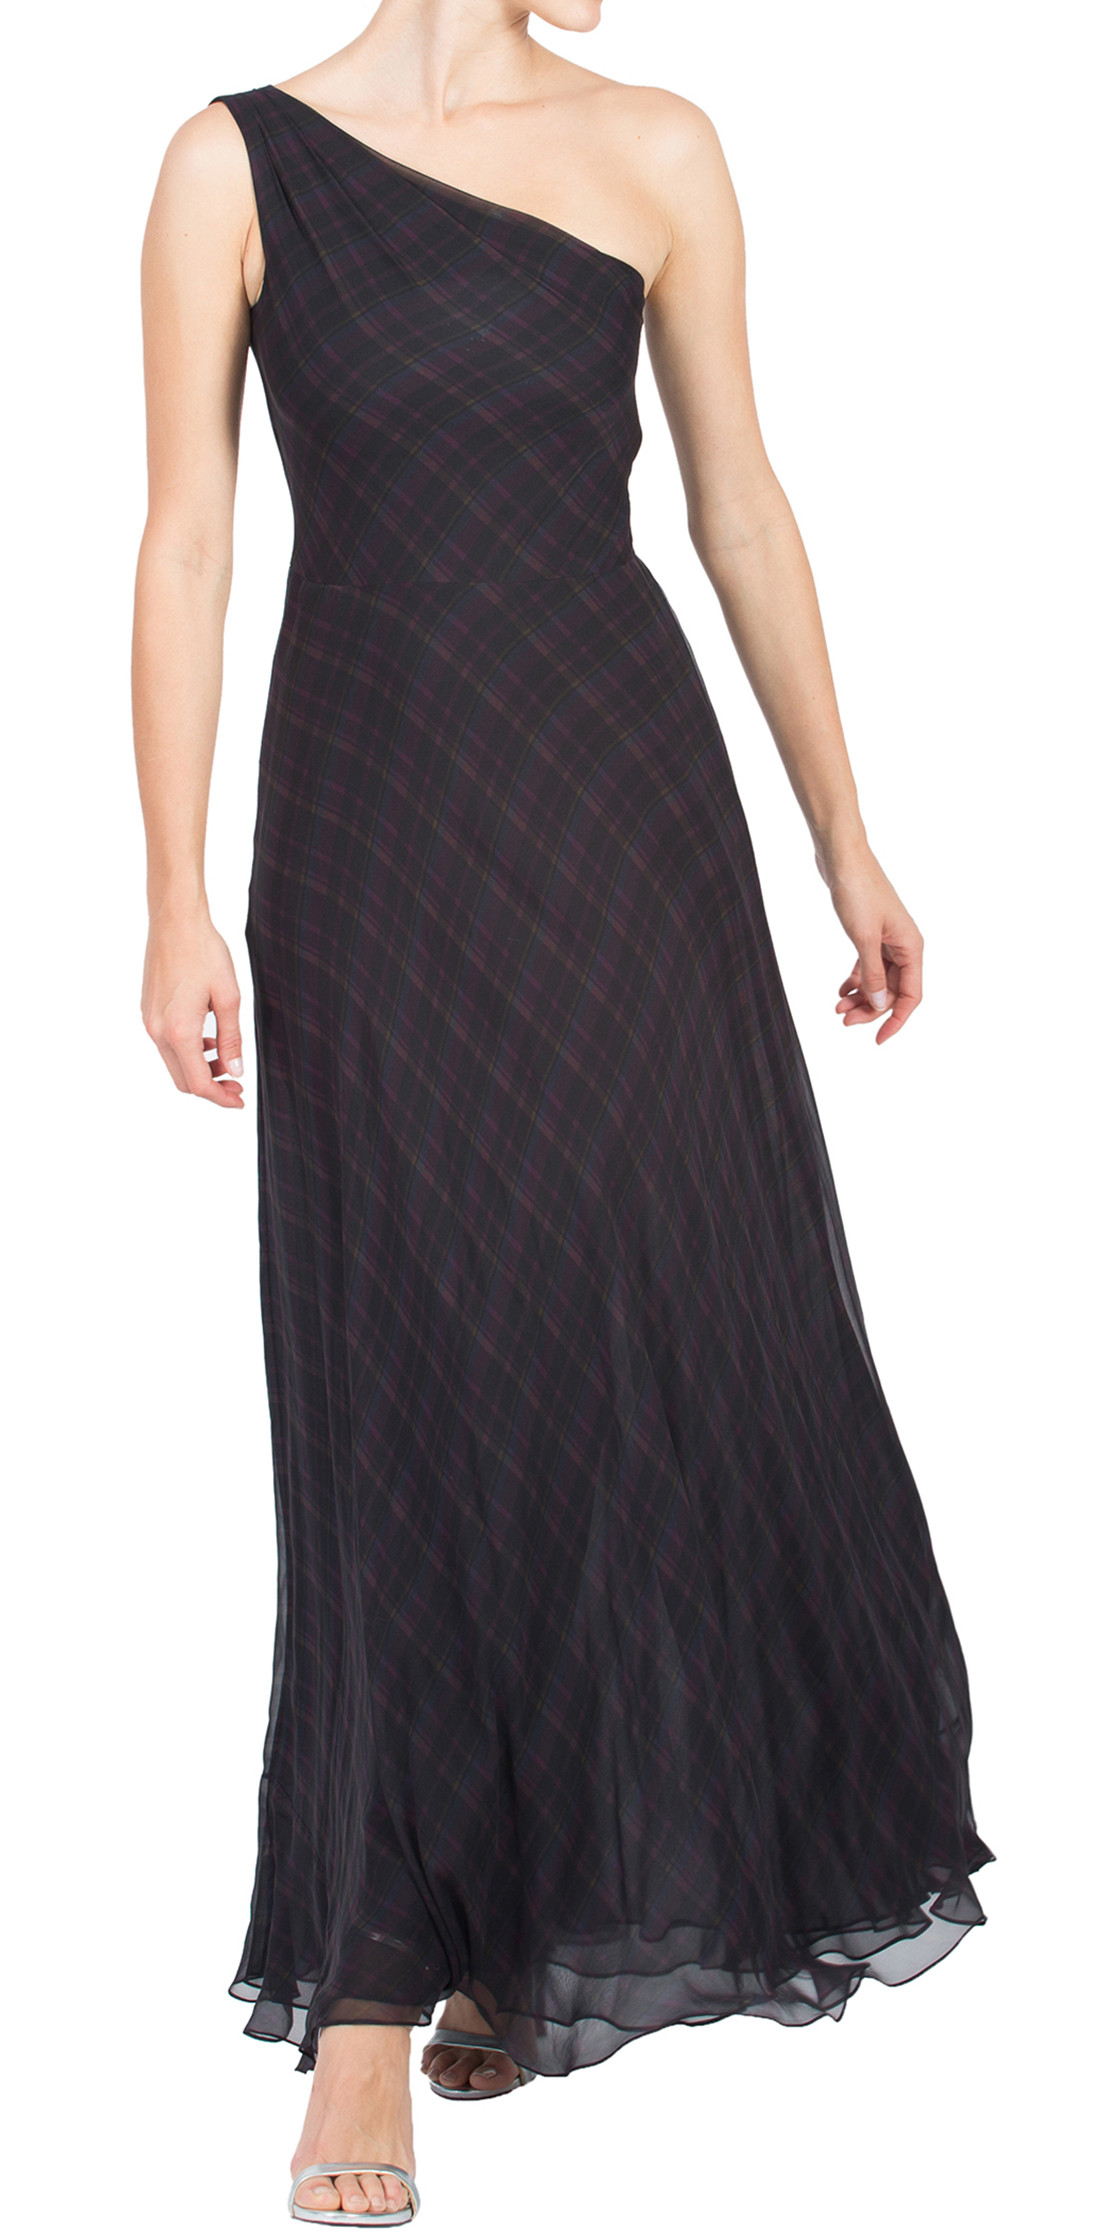 Ralph Lauren One Shoulder Chiffon Gown